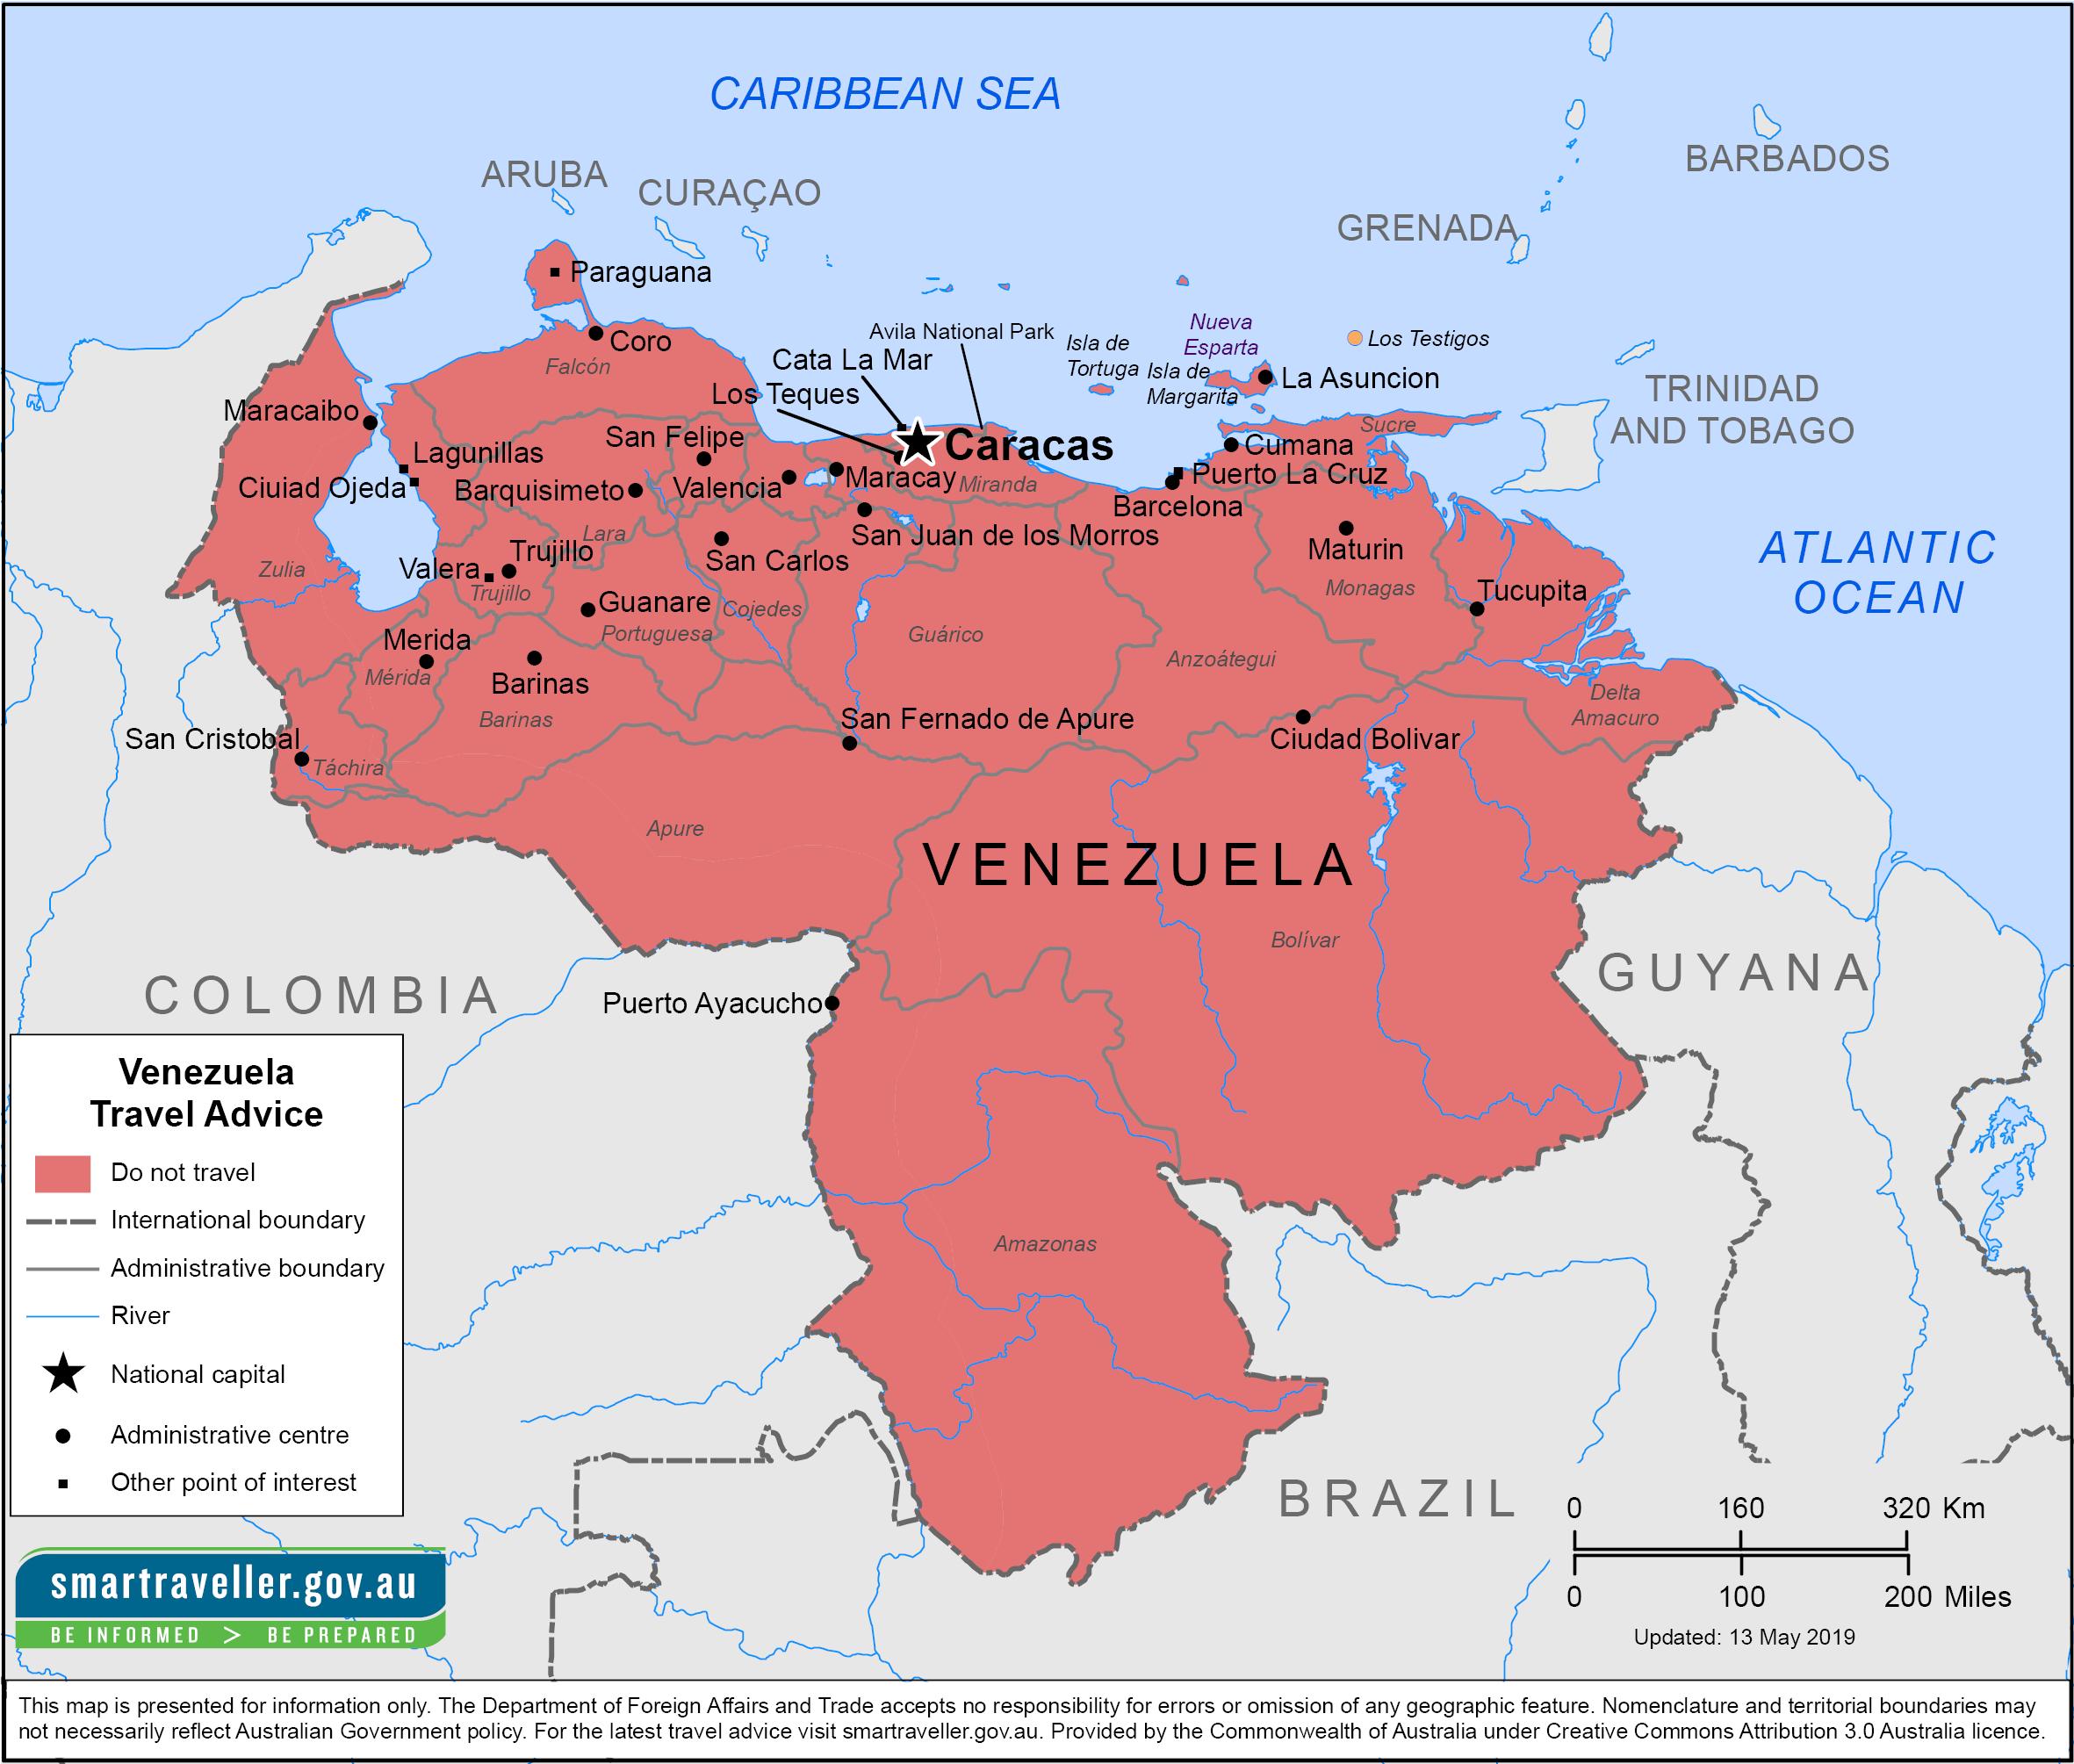 Venezuela Travel Health Insurance - Country Review